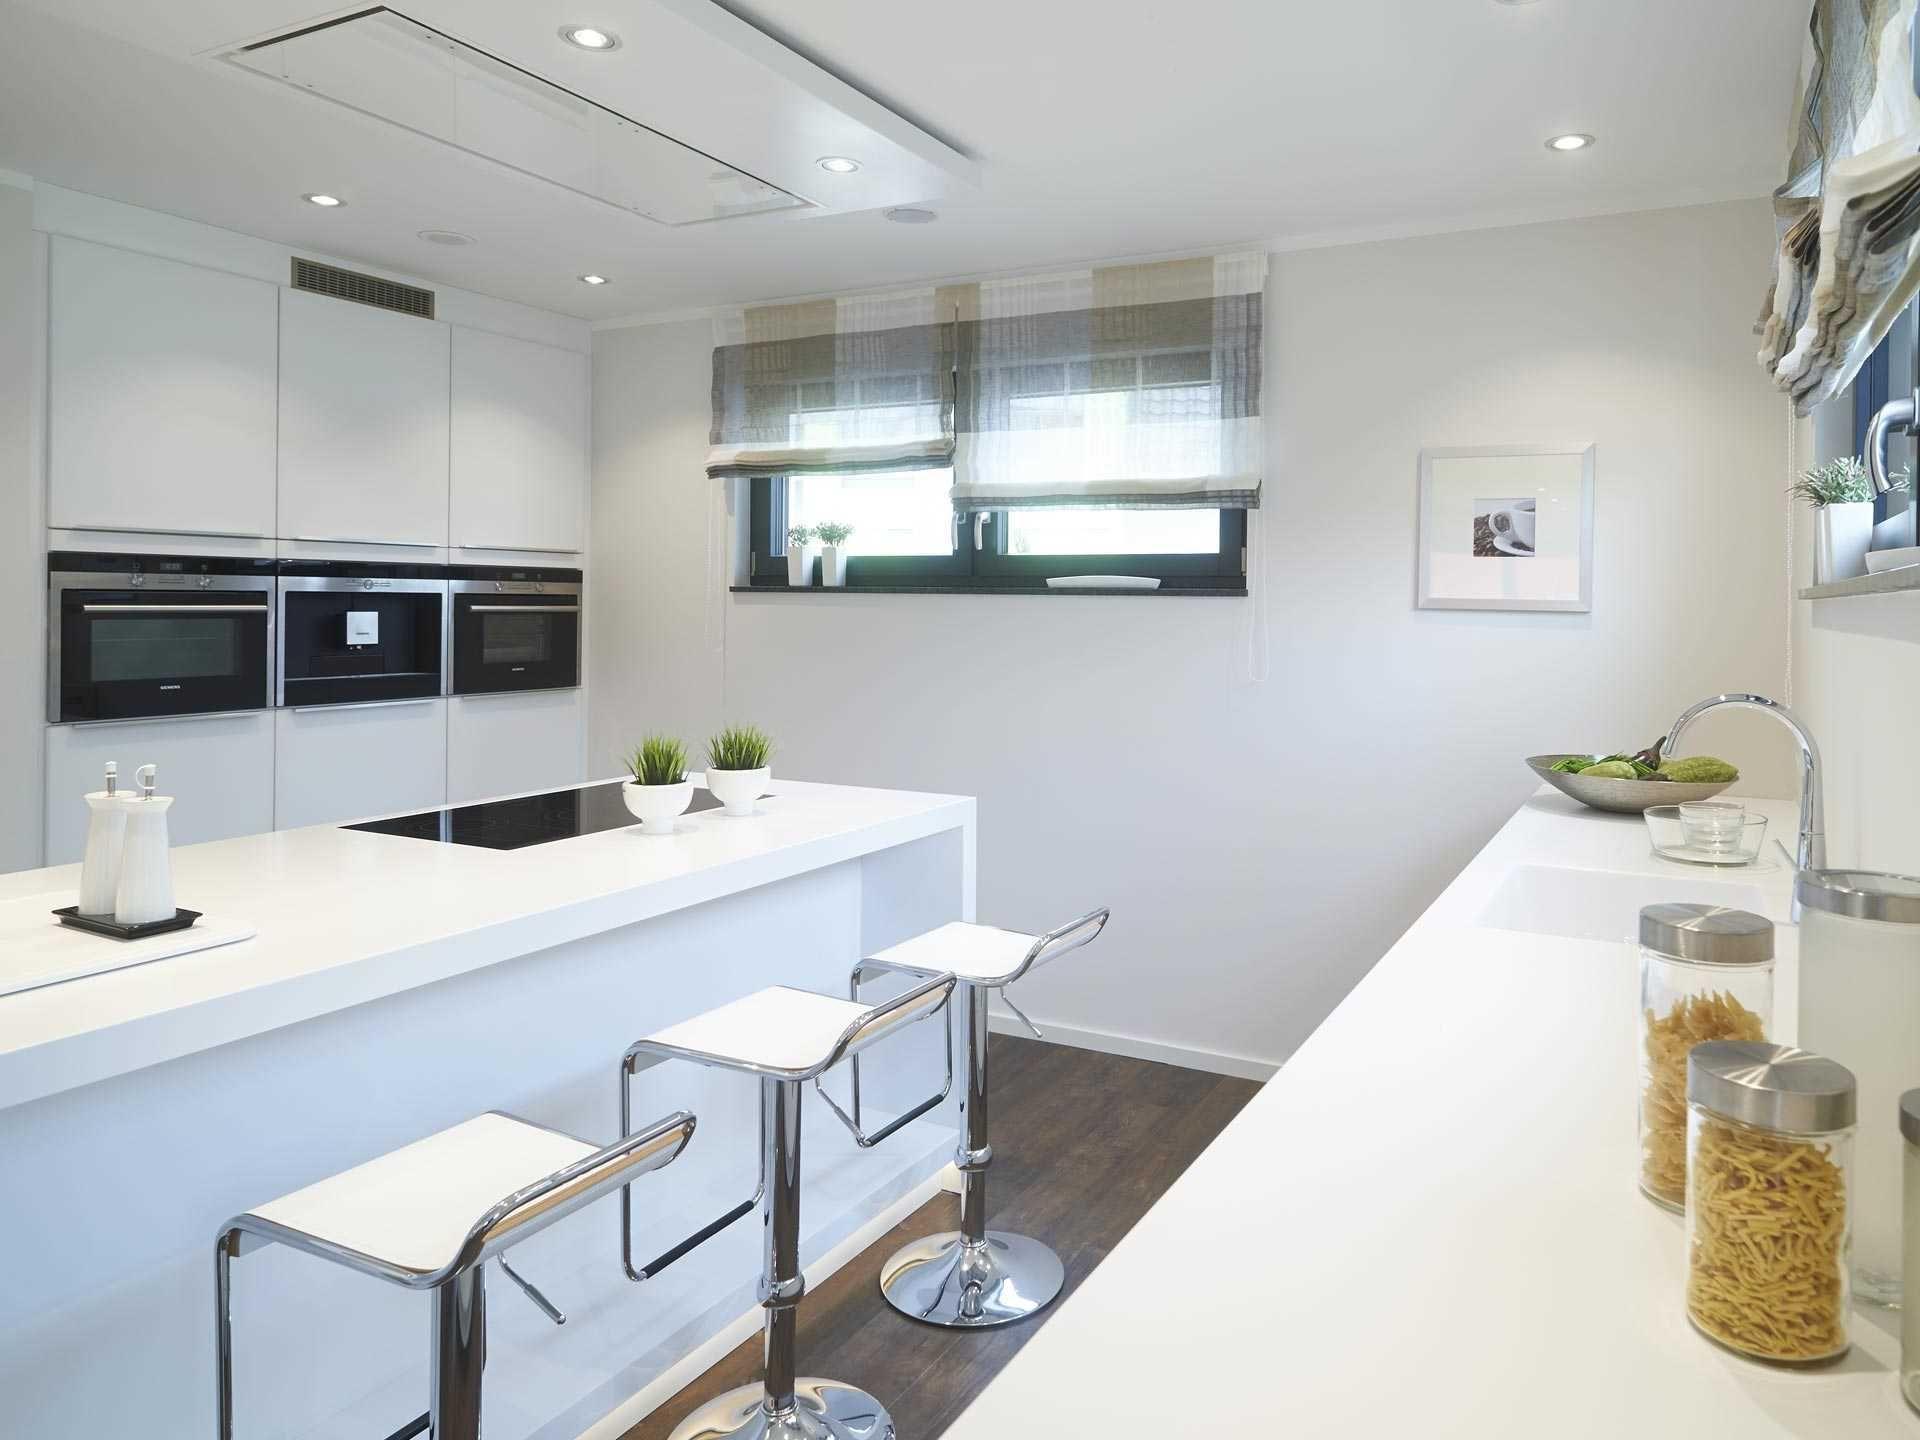 Haus Twinline R Savona - Rensch-Haus in 2020 | Musterhaus ...